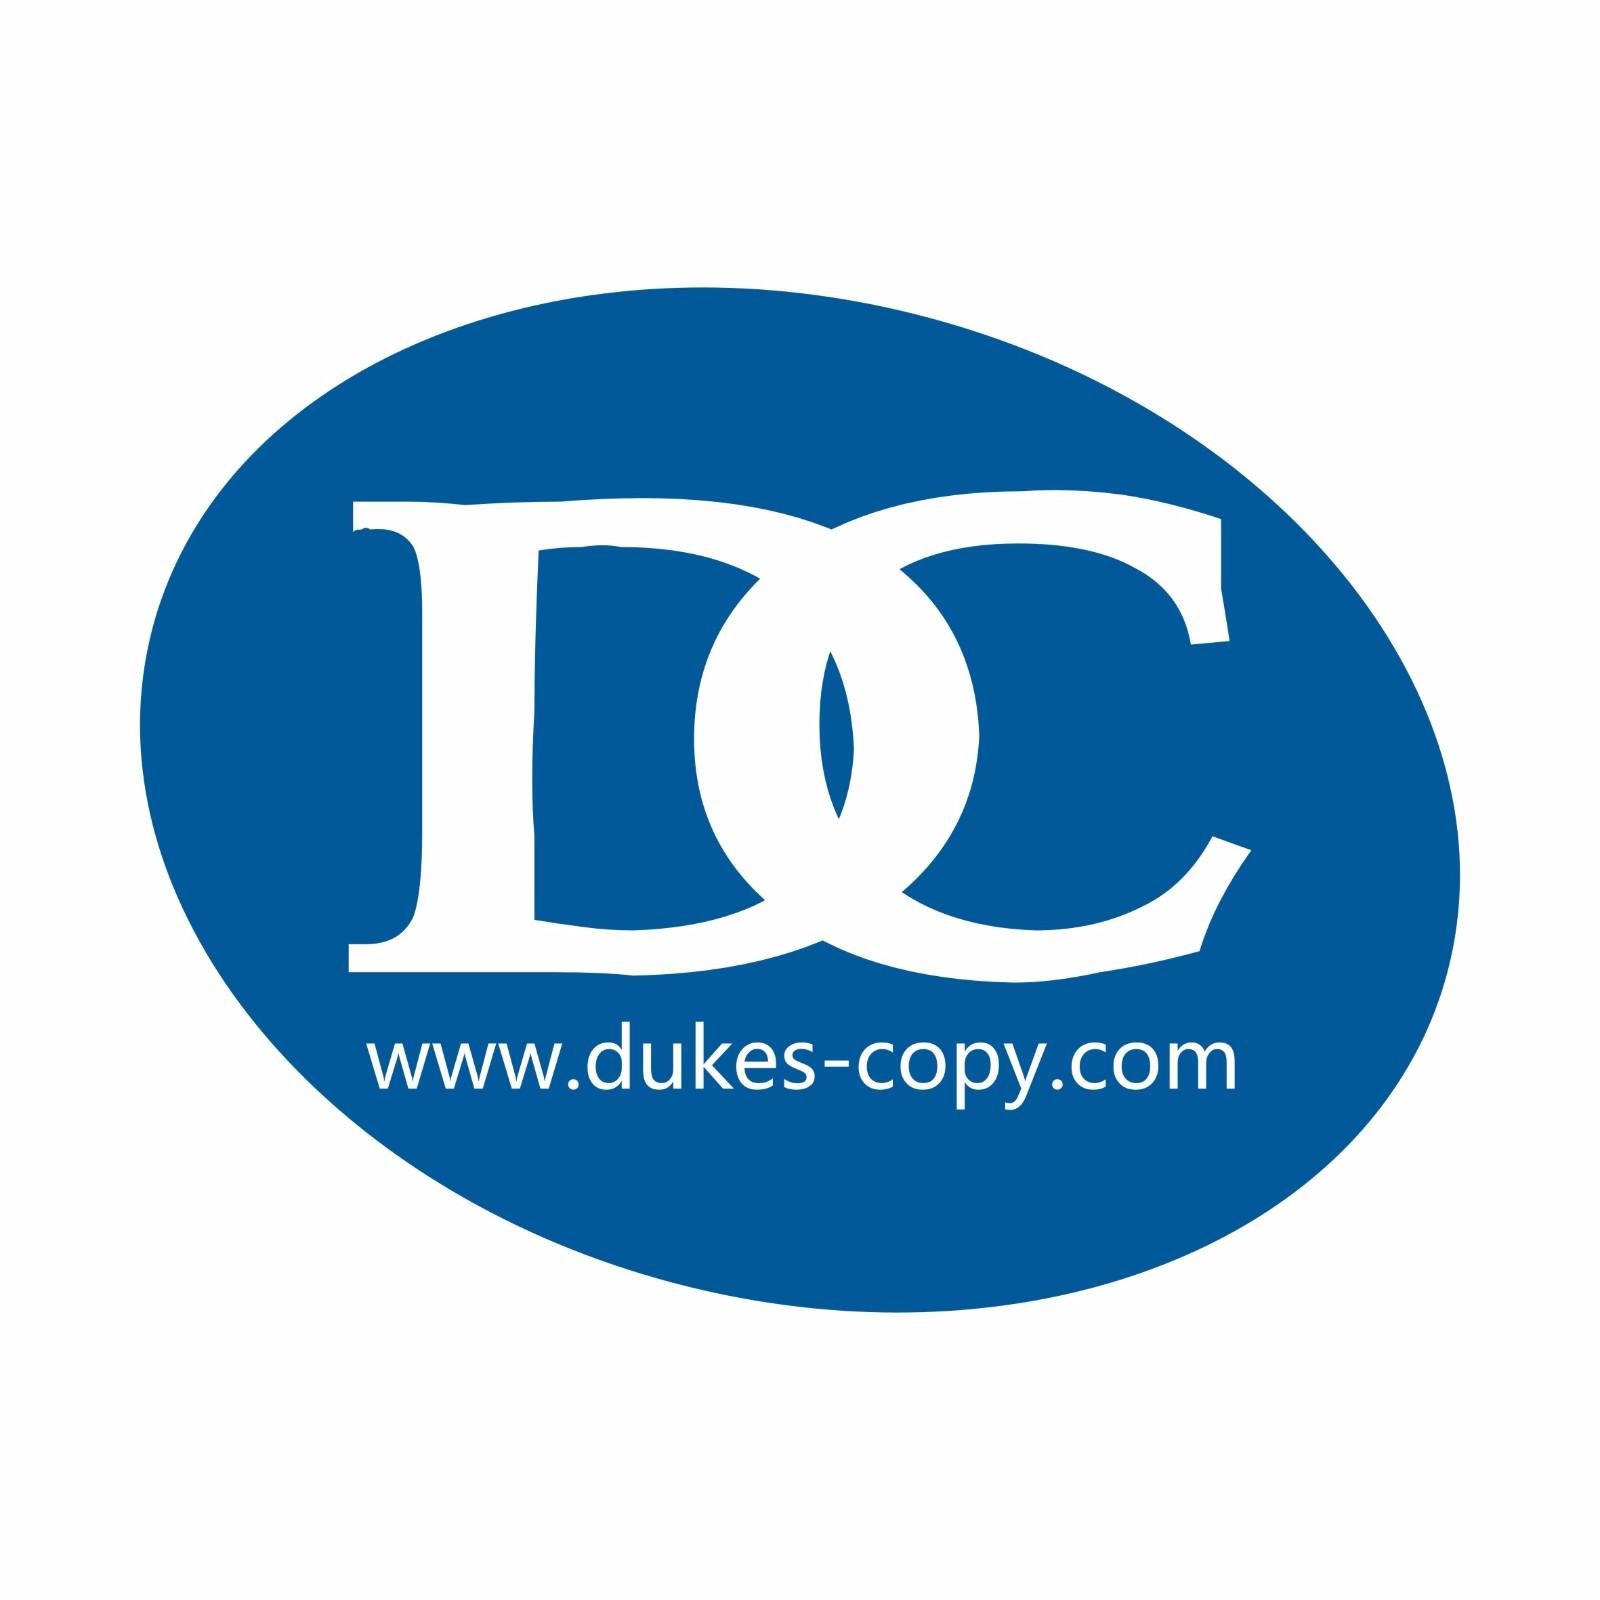 logo logo 标识 标志 设计 图标 1600_1600